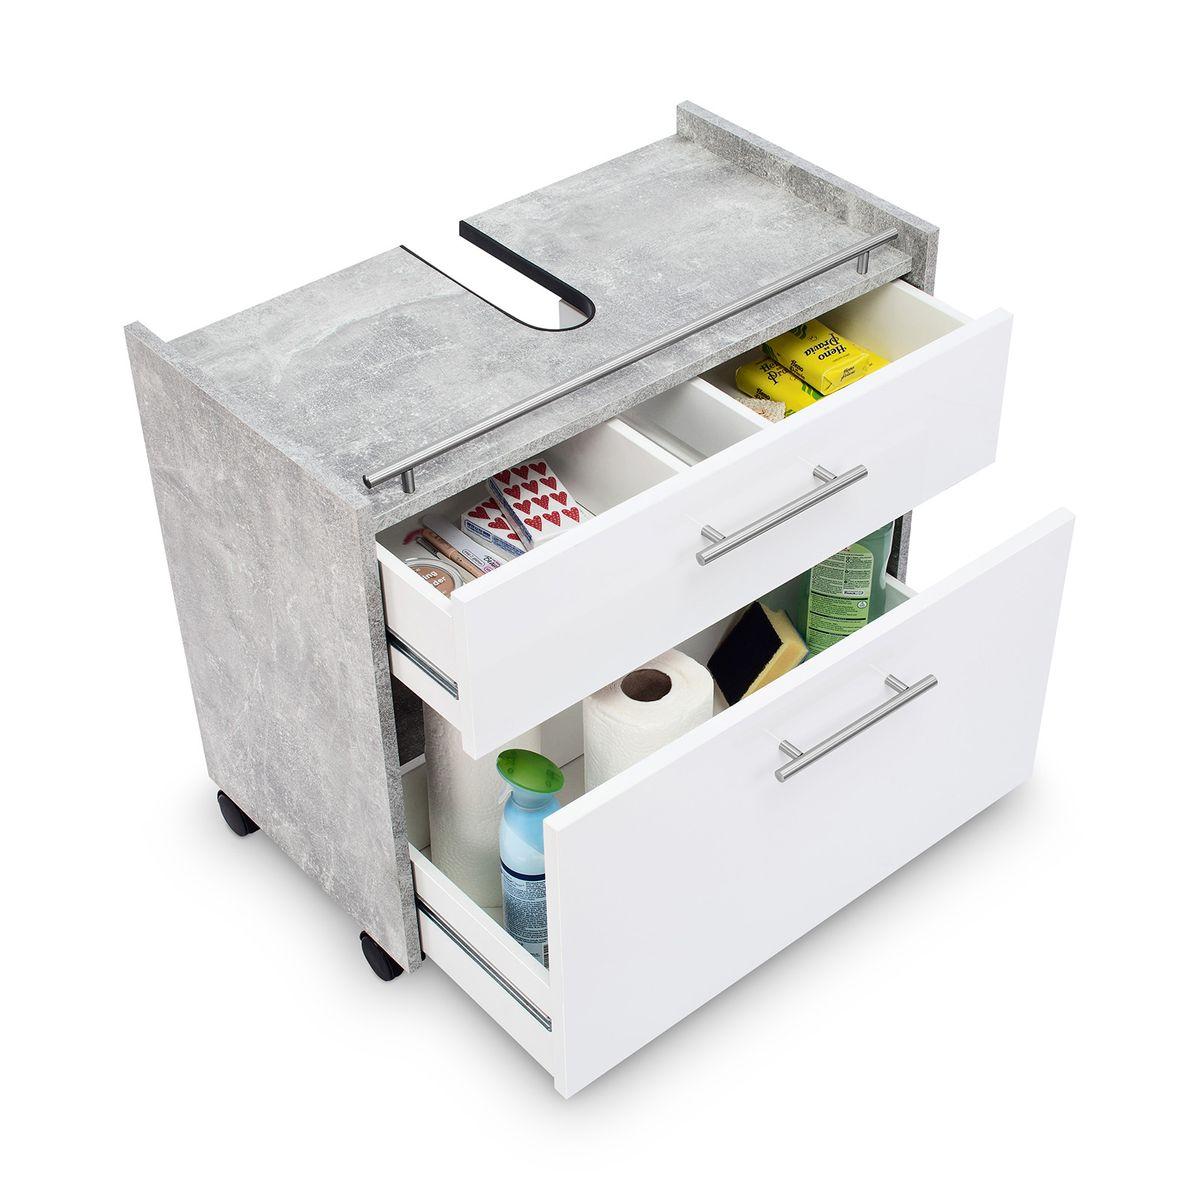 Badmöbel-Set FROSTI 2-teilig Beton Weiß – Bild 6